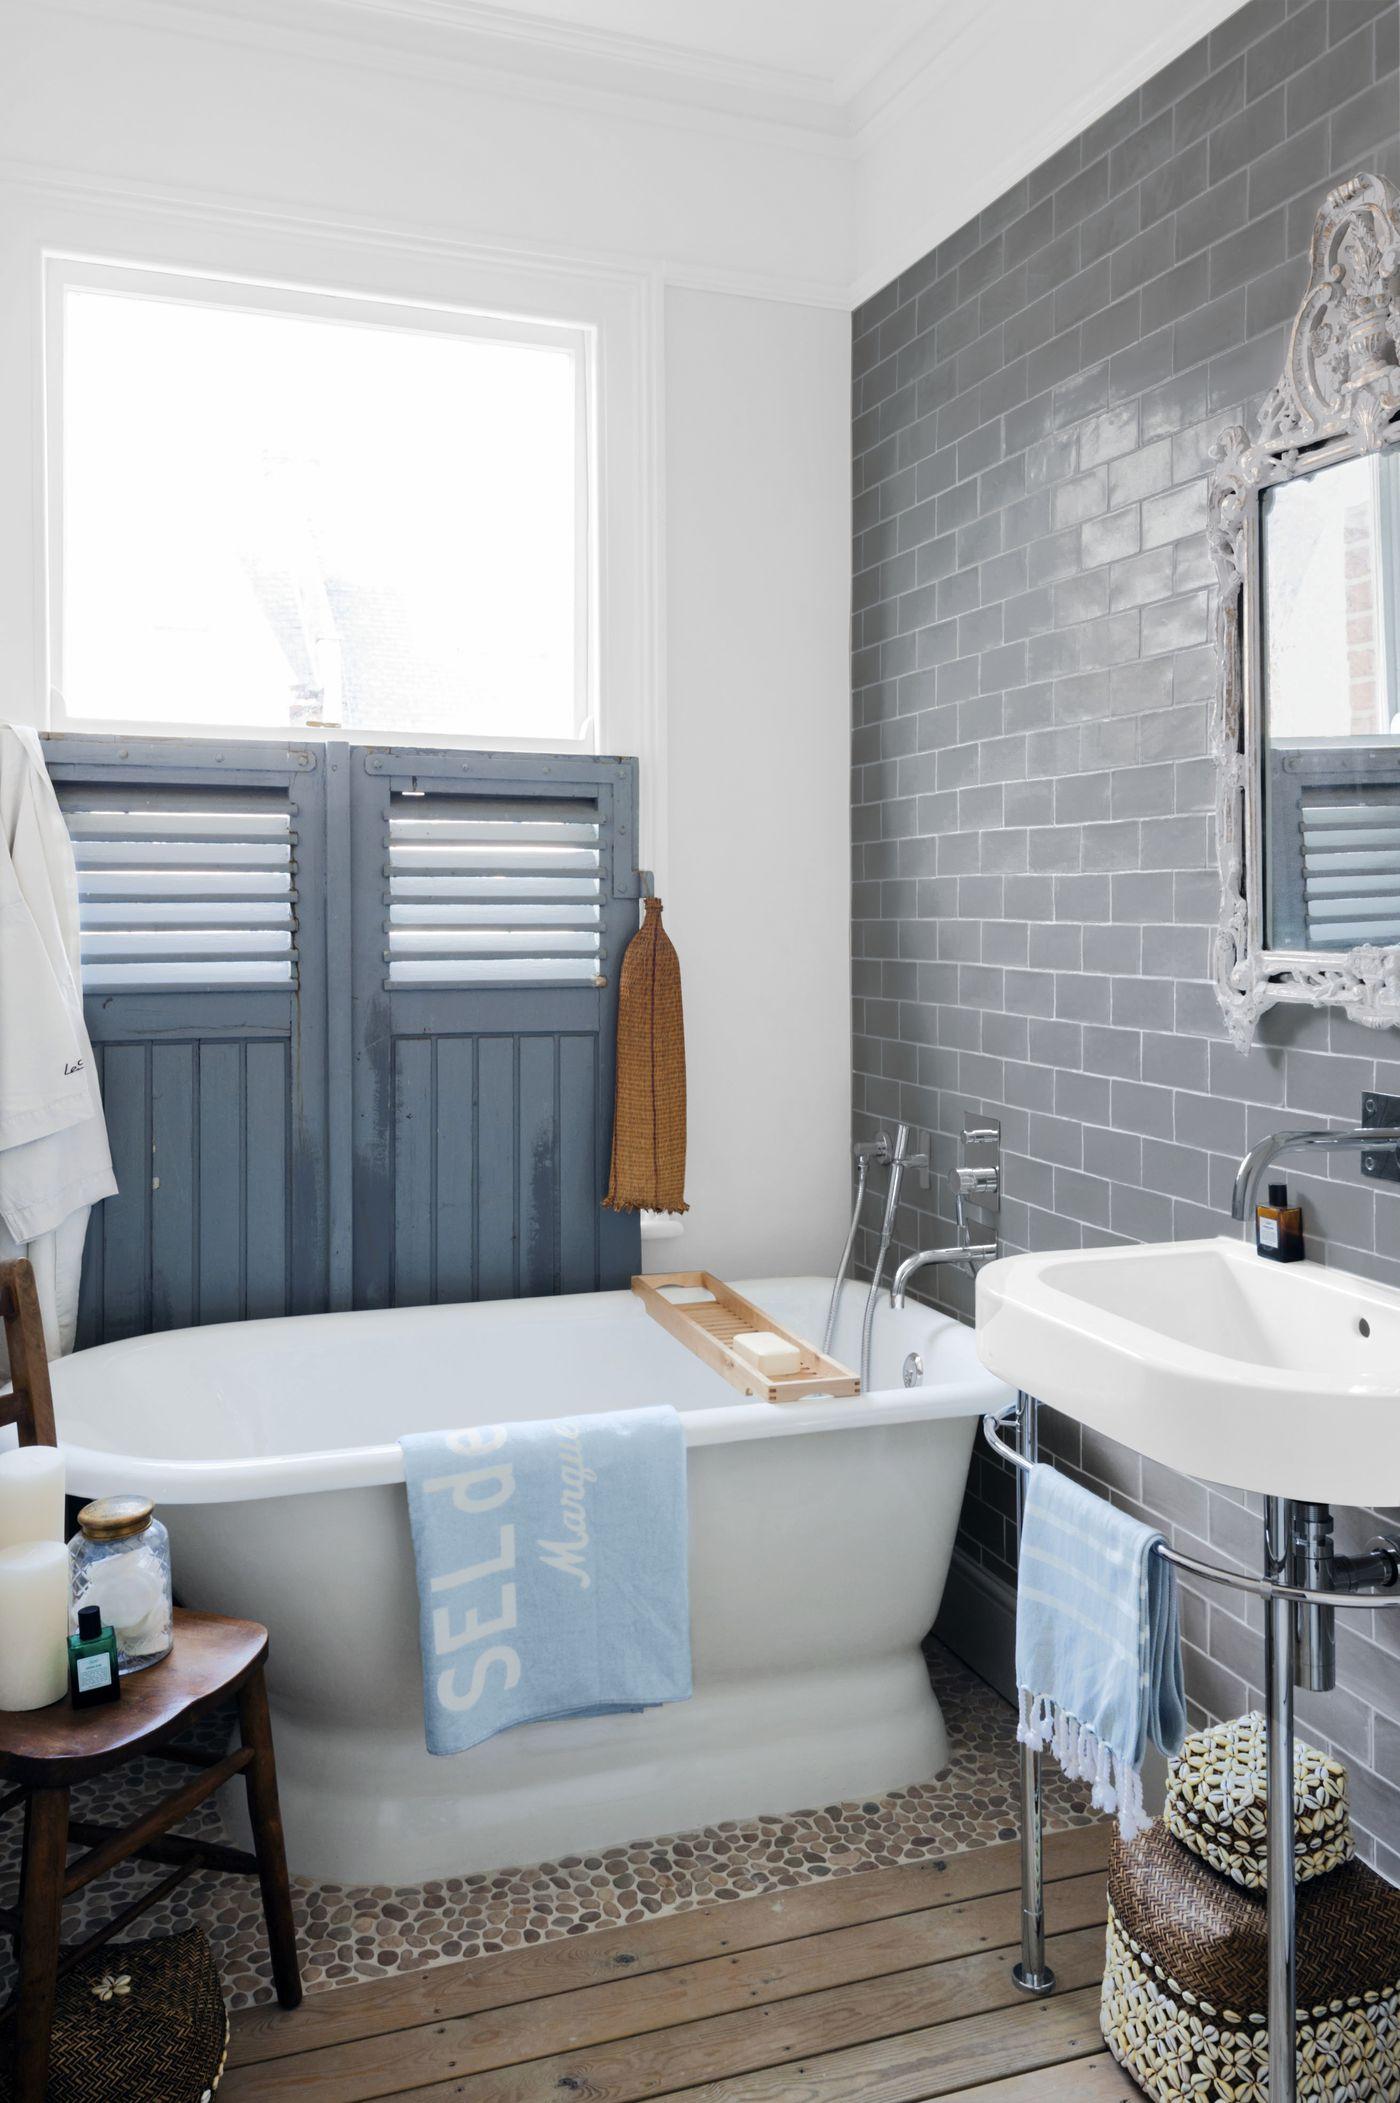 20 Budget Friendly Bath Ideas This